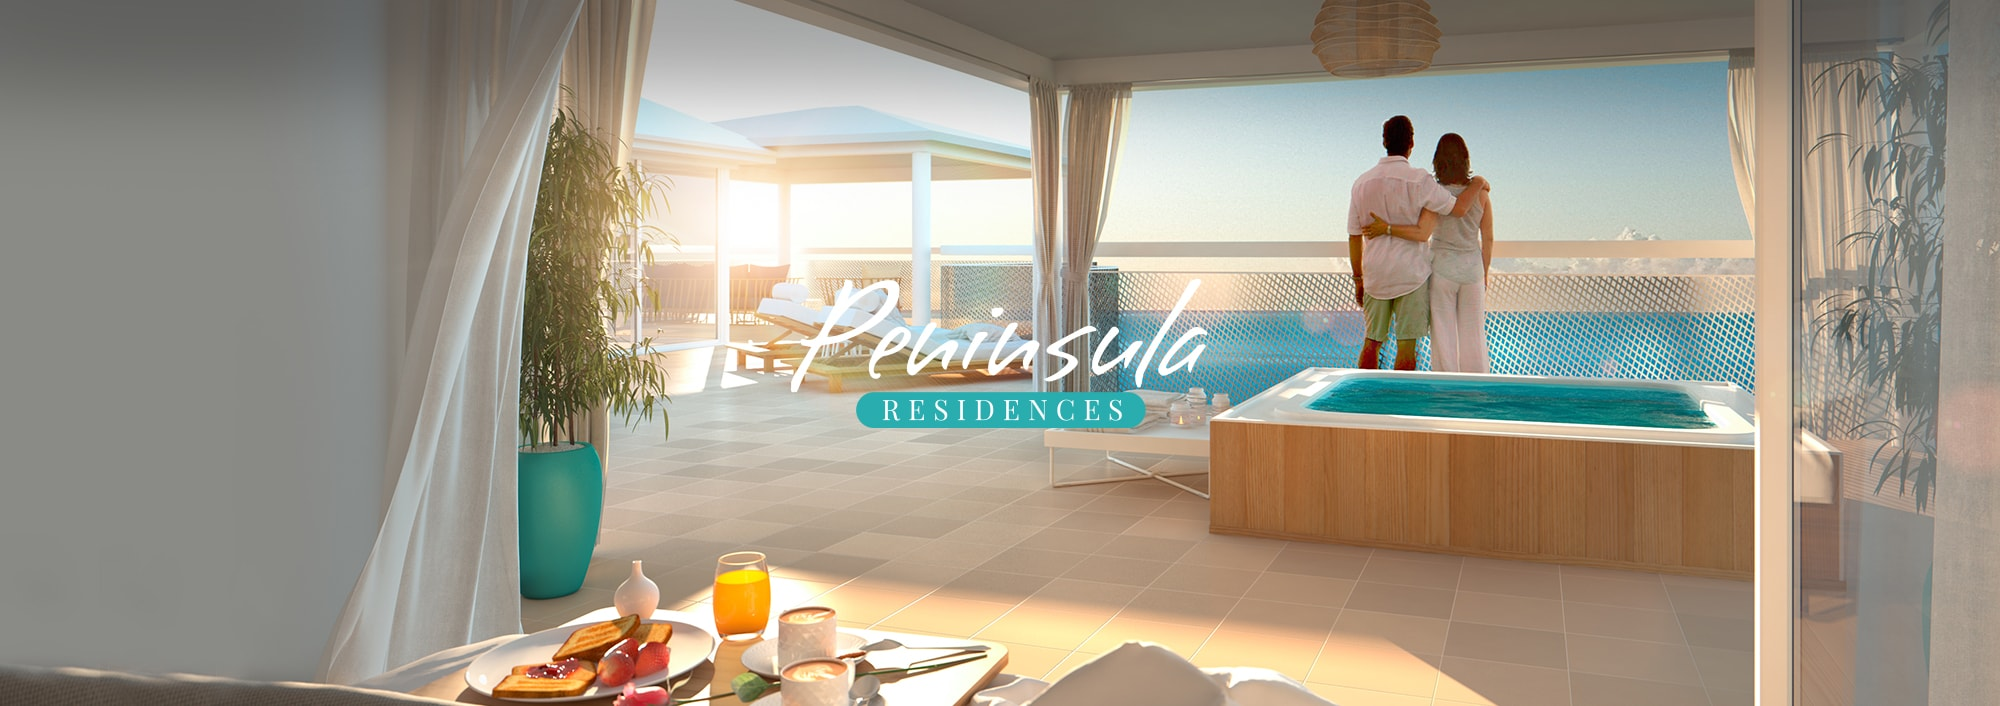 Peninsula Residences - Reserva del Higuerón